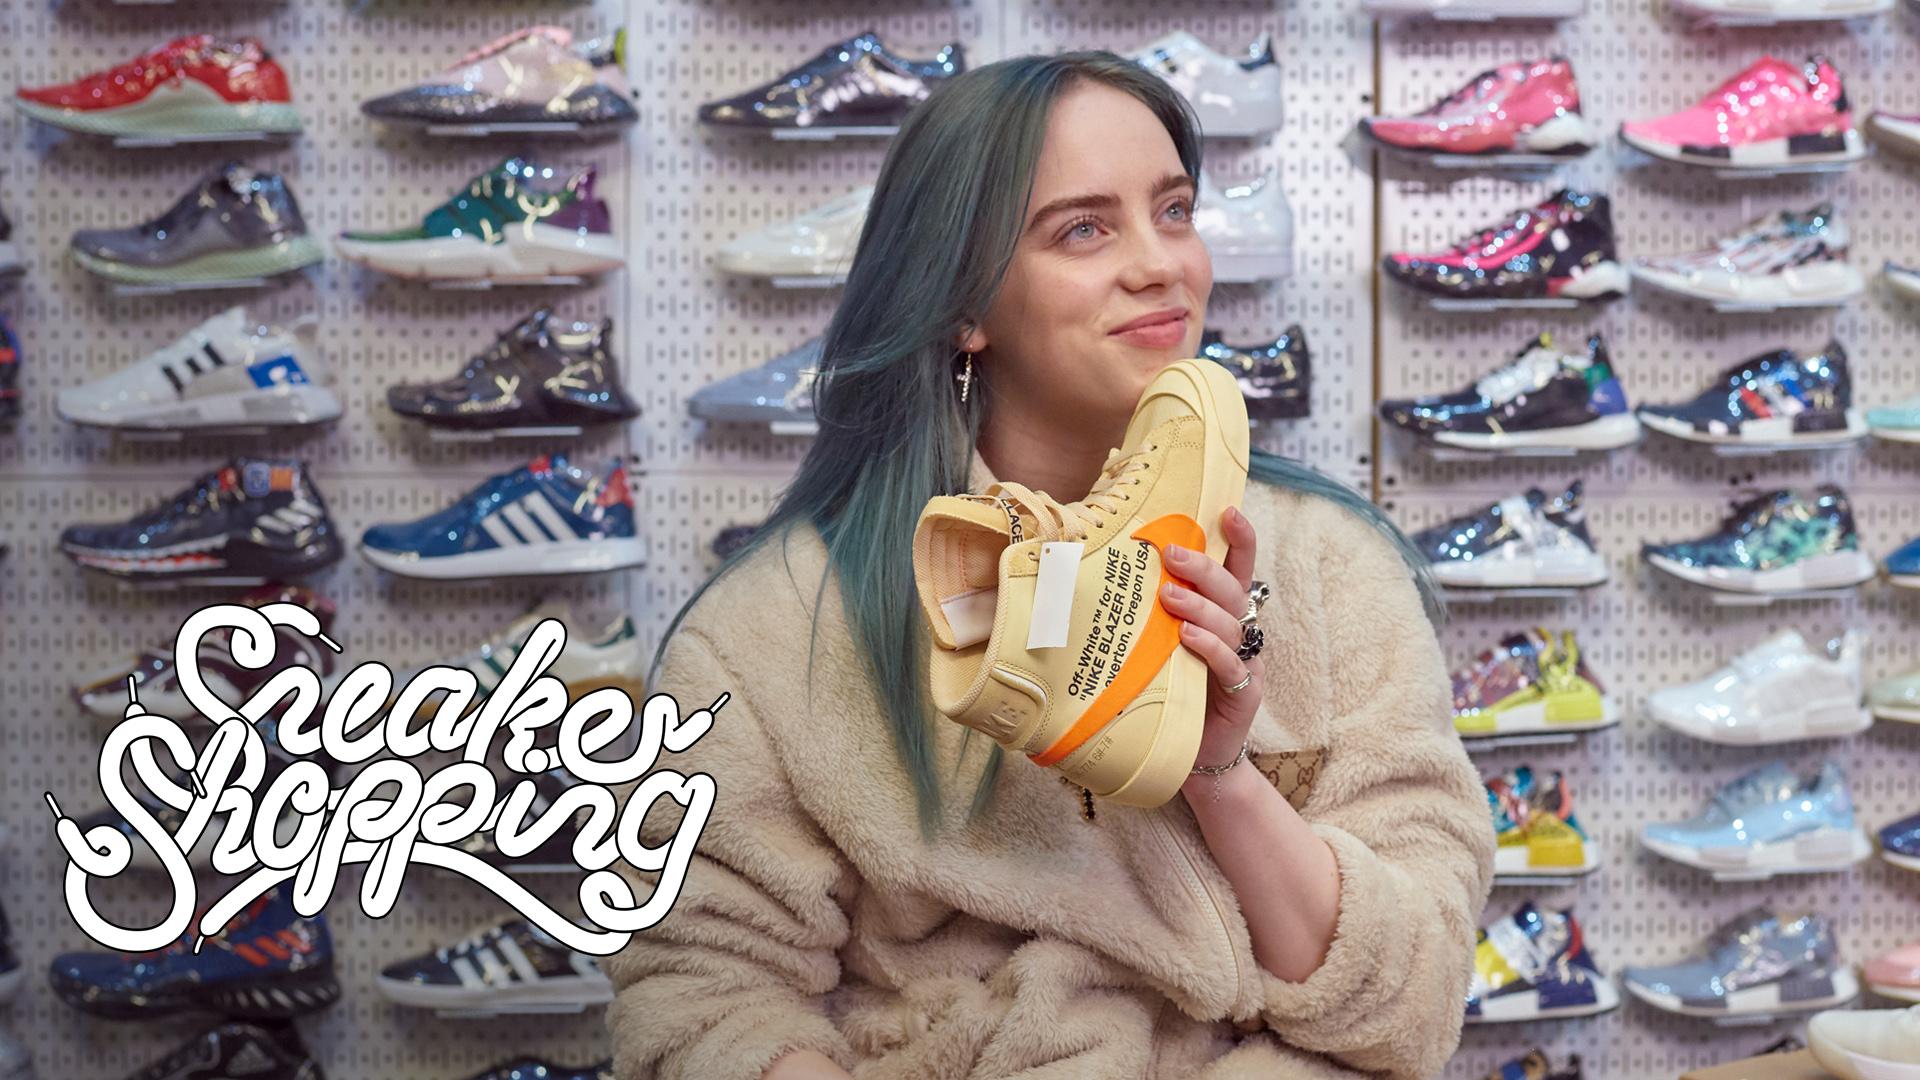 62cb5a701d01  Sneaker Shopping  with Billie Eilish